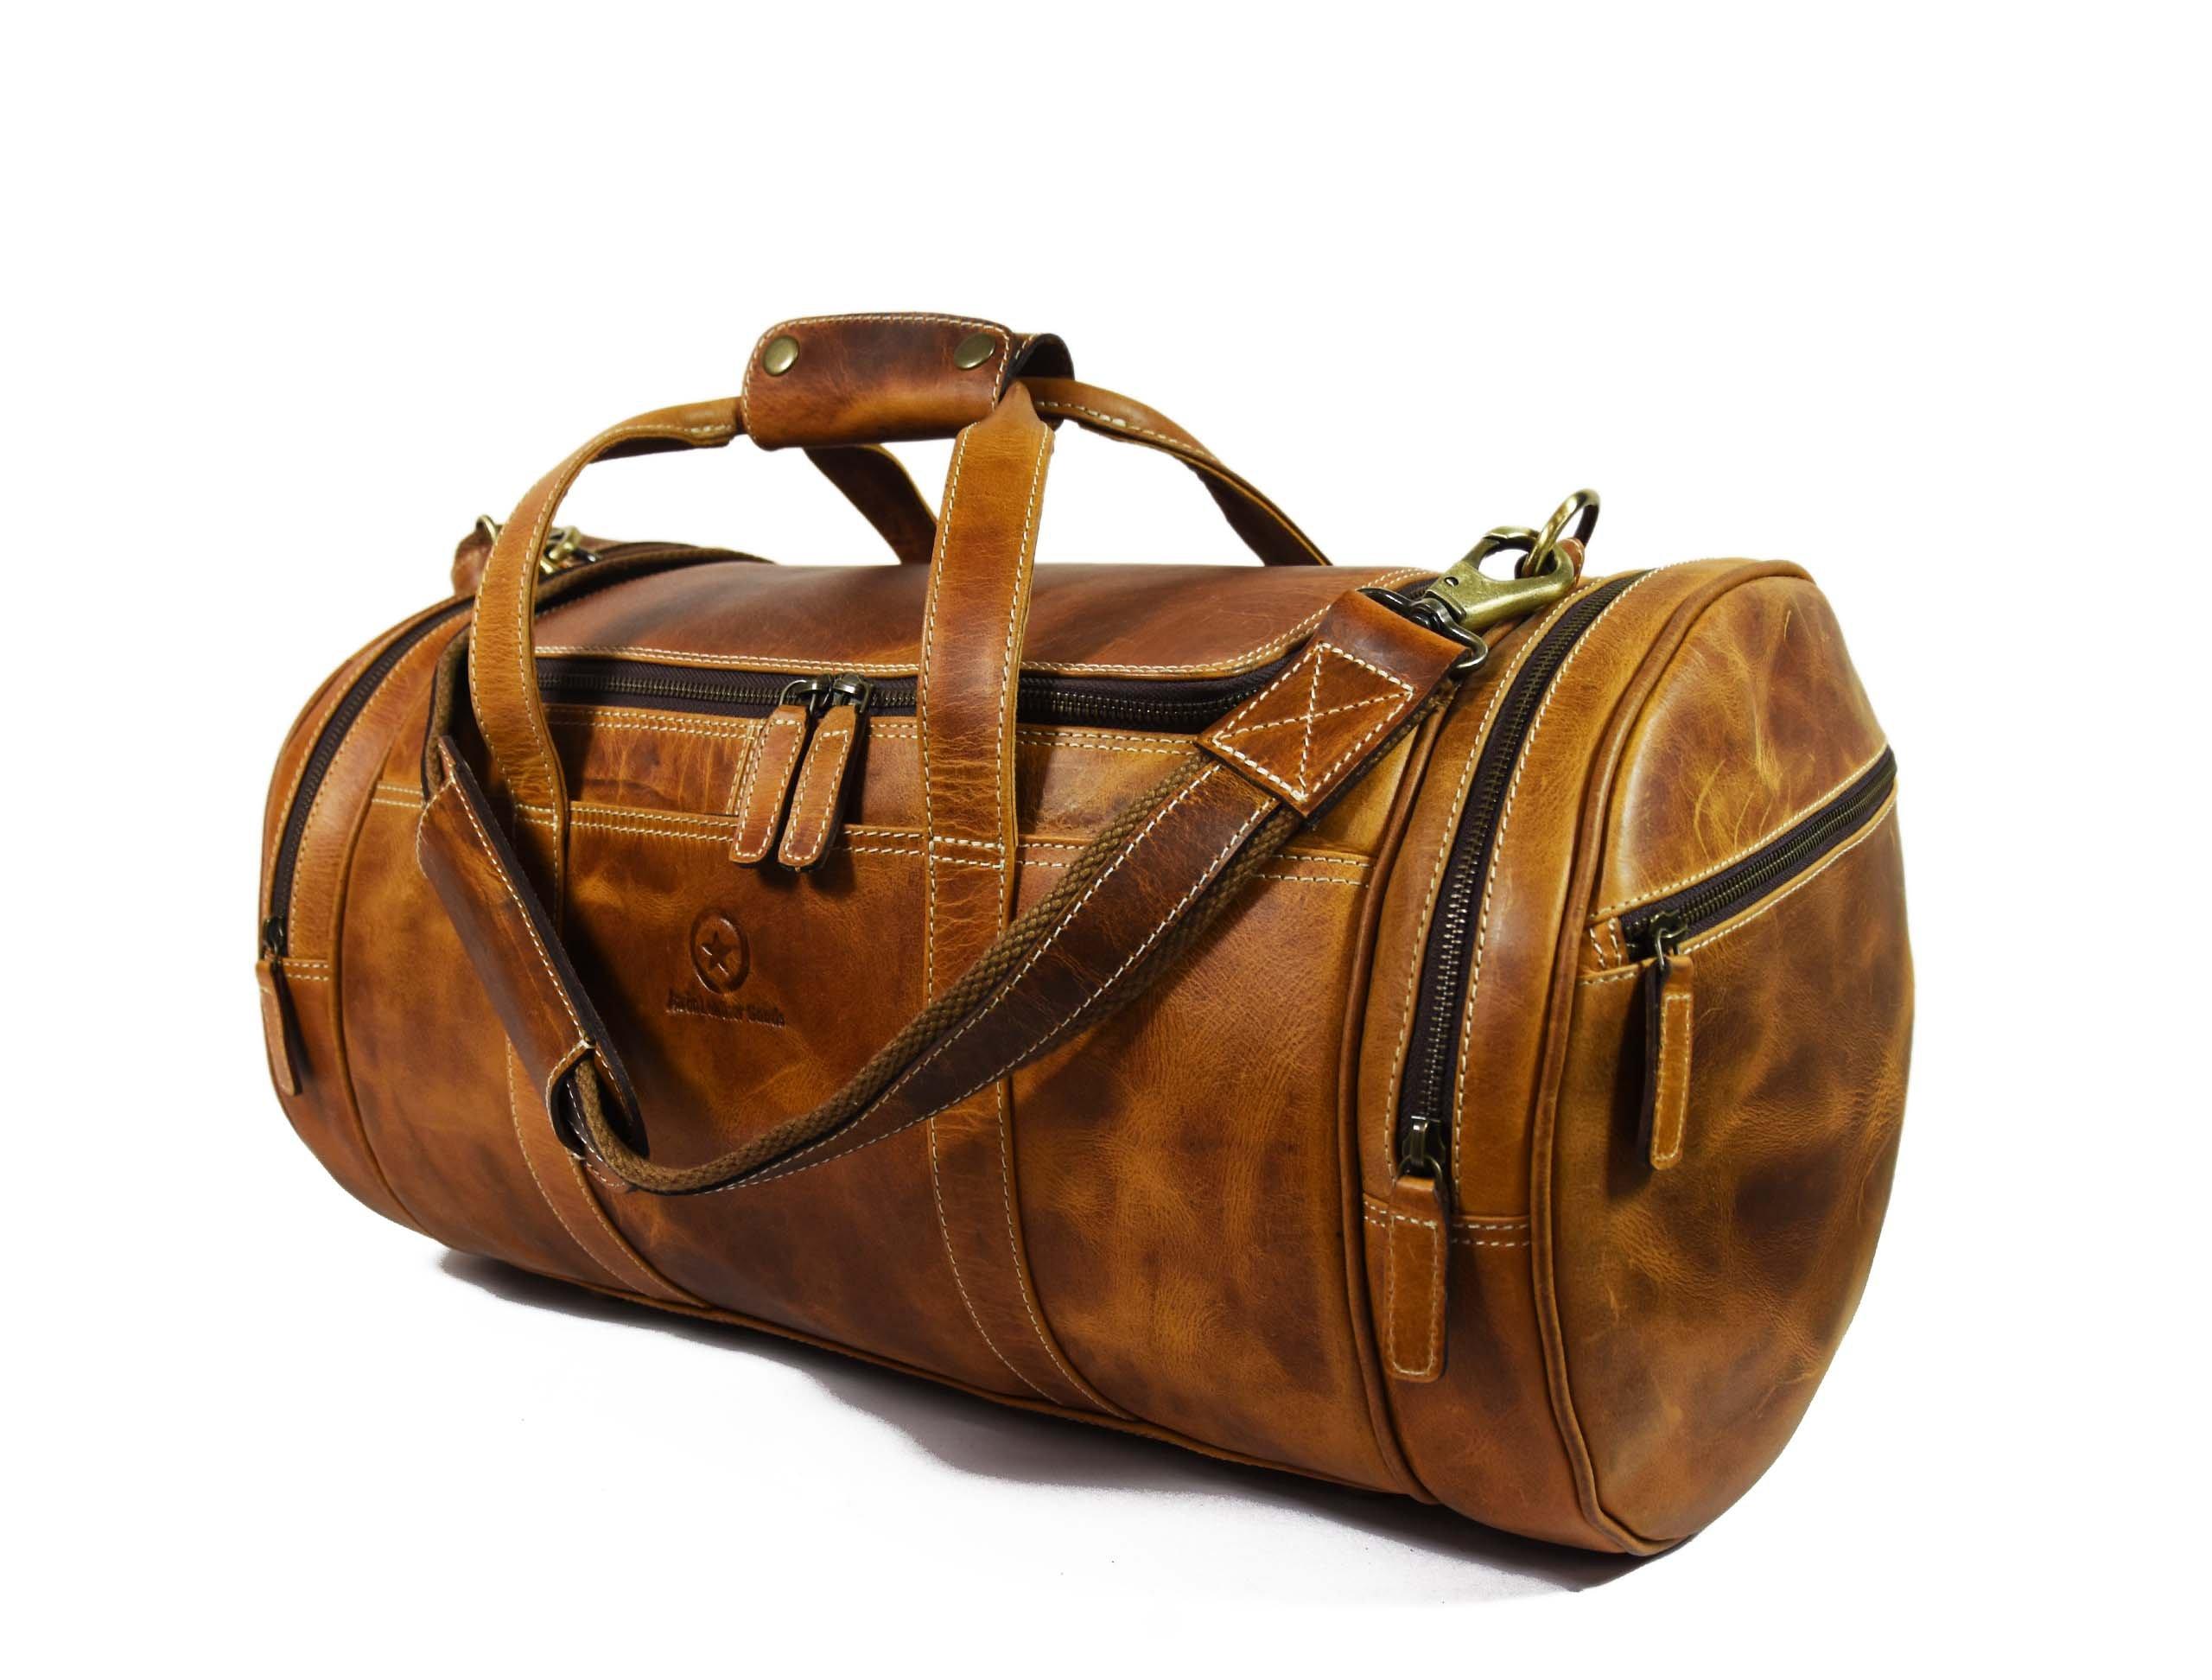 Travel Duffel Overnight Barrel Weekend Leather Bag by Aaron Leather (Brown) by Aaron Leather (Image #2)